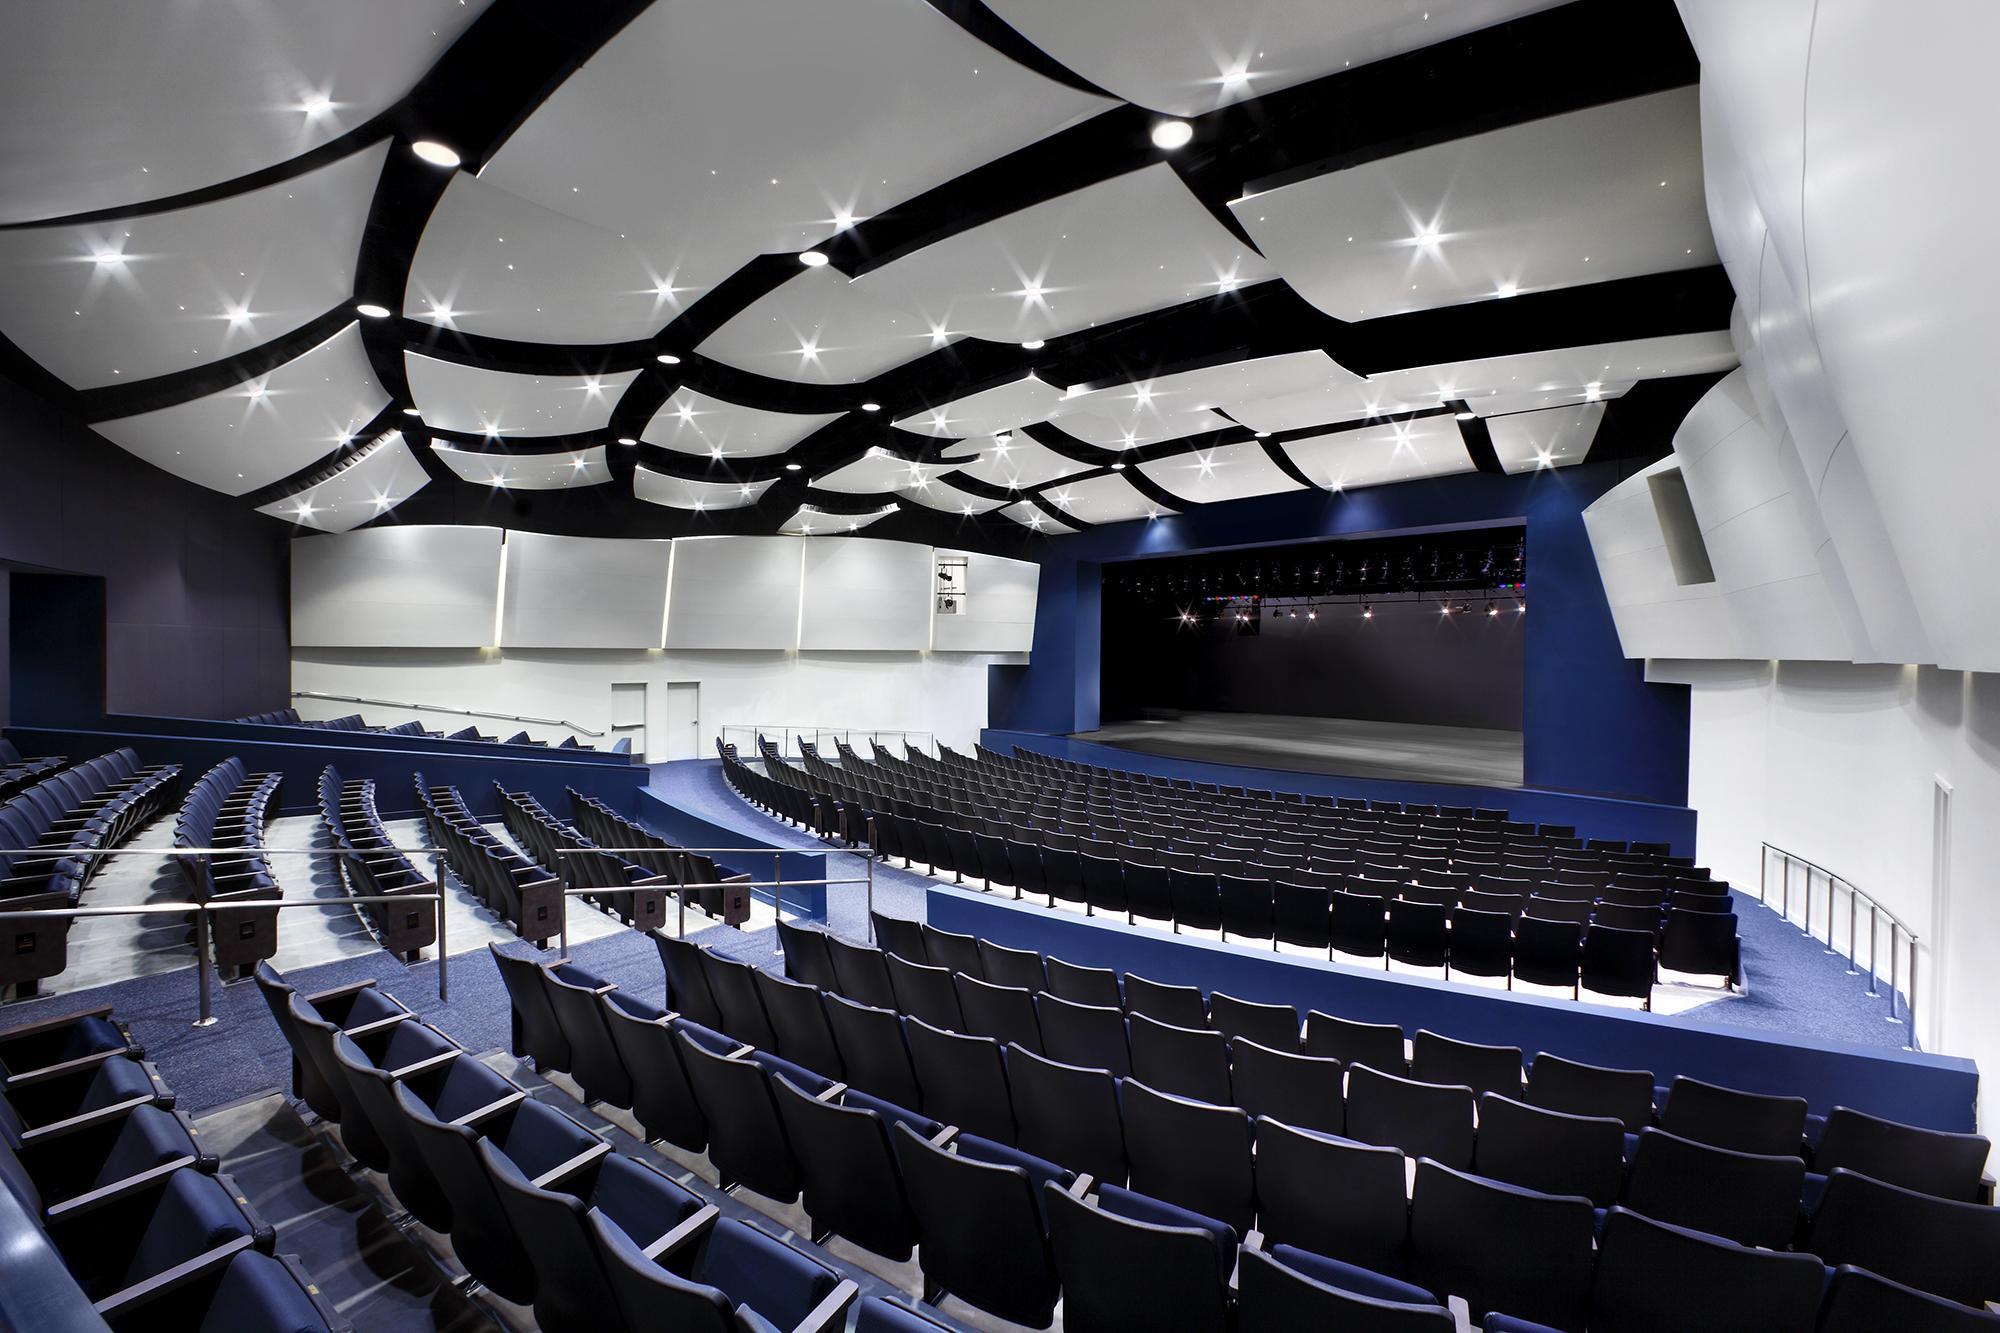 Newport Harbor High School Theater_001_High Res_Cristi Costea copy.jpg